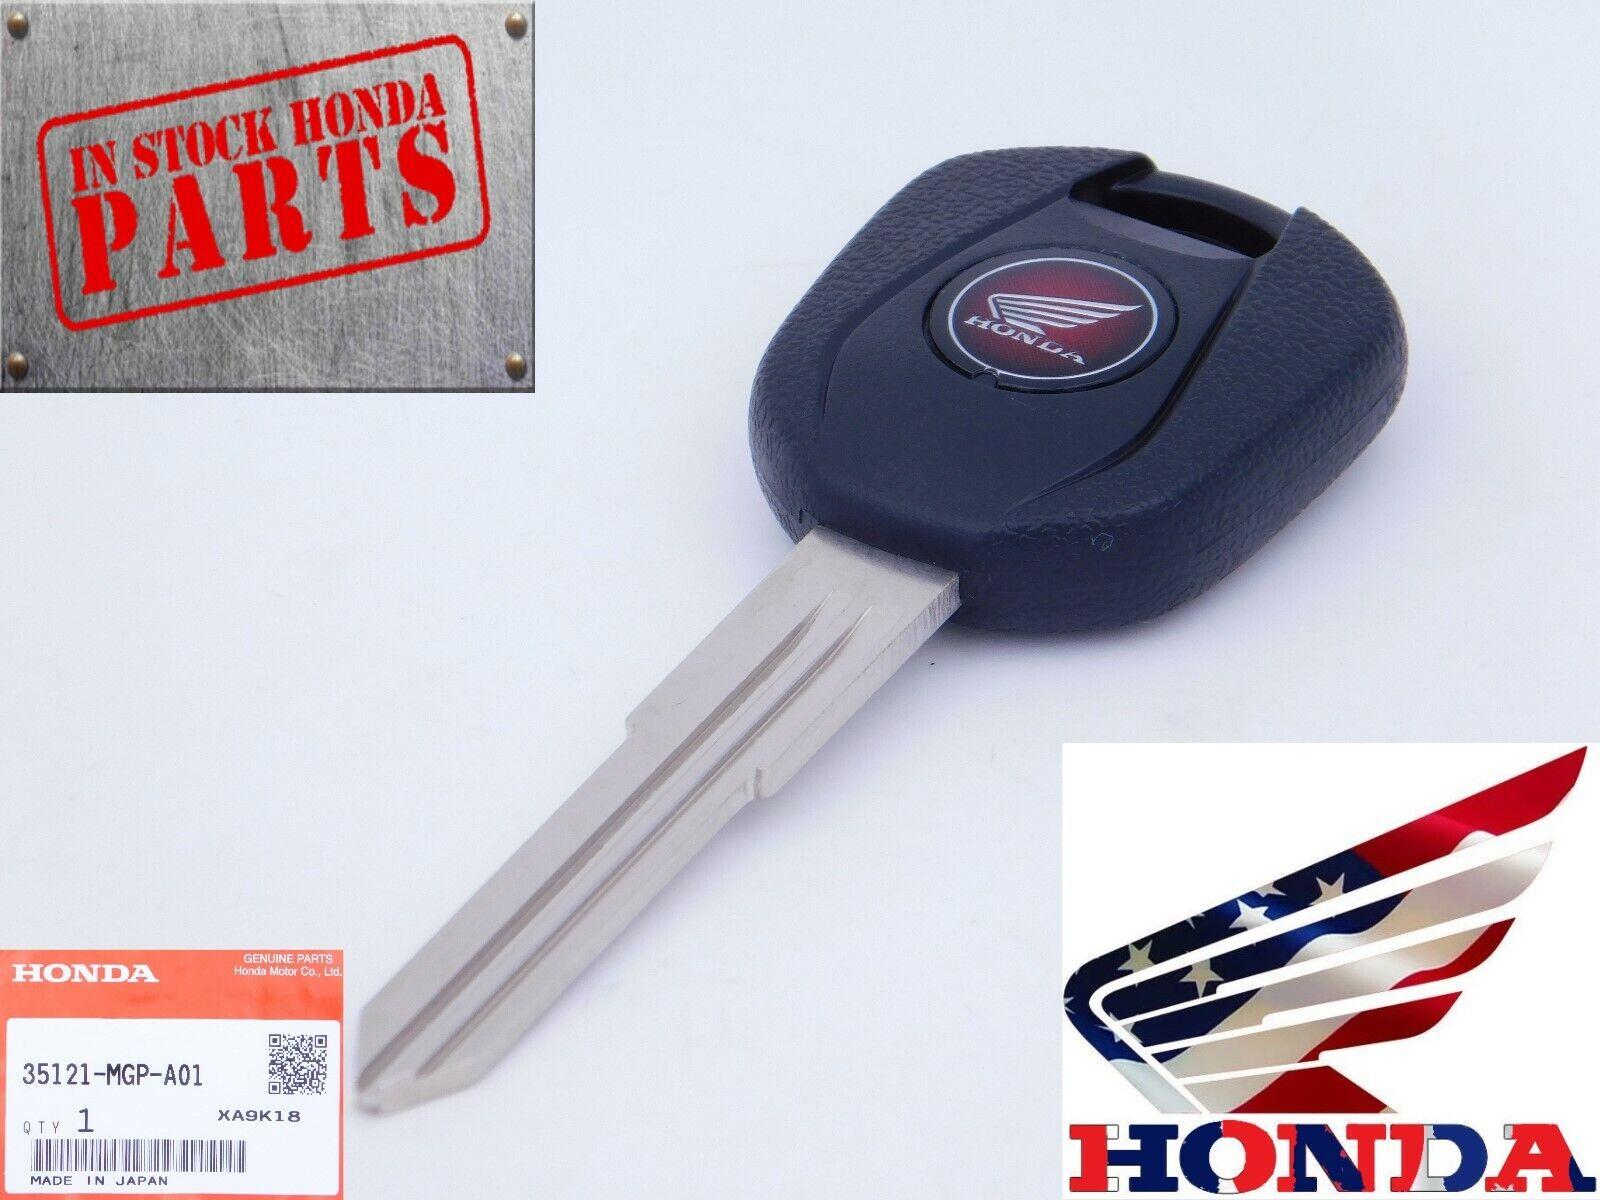 MC Motoparts Black Square Key Keychain Wall Hooks Logo 2pcs For HONDA CBR600RR CBR1000RR Fireblade CBR 250RR 650F